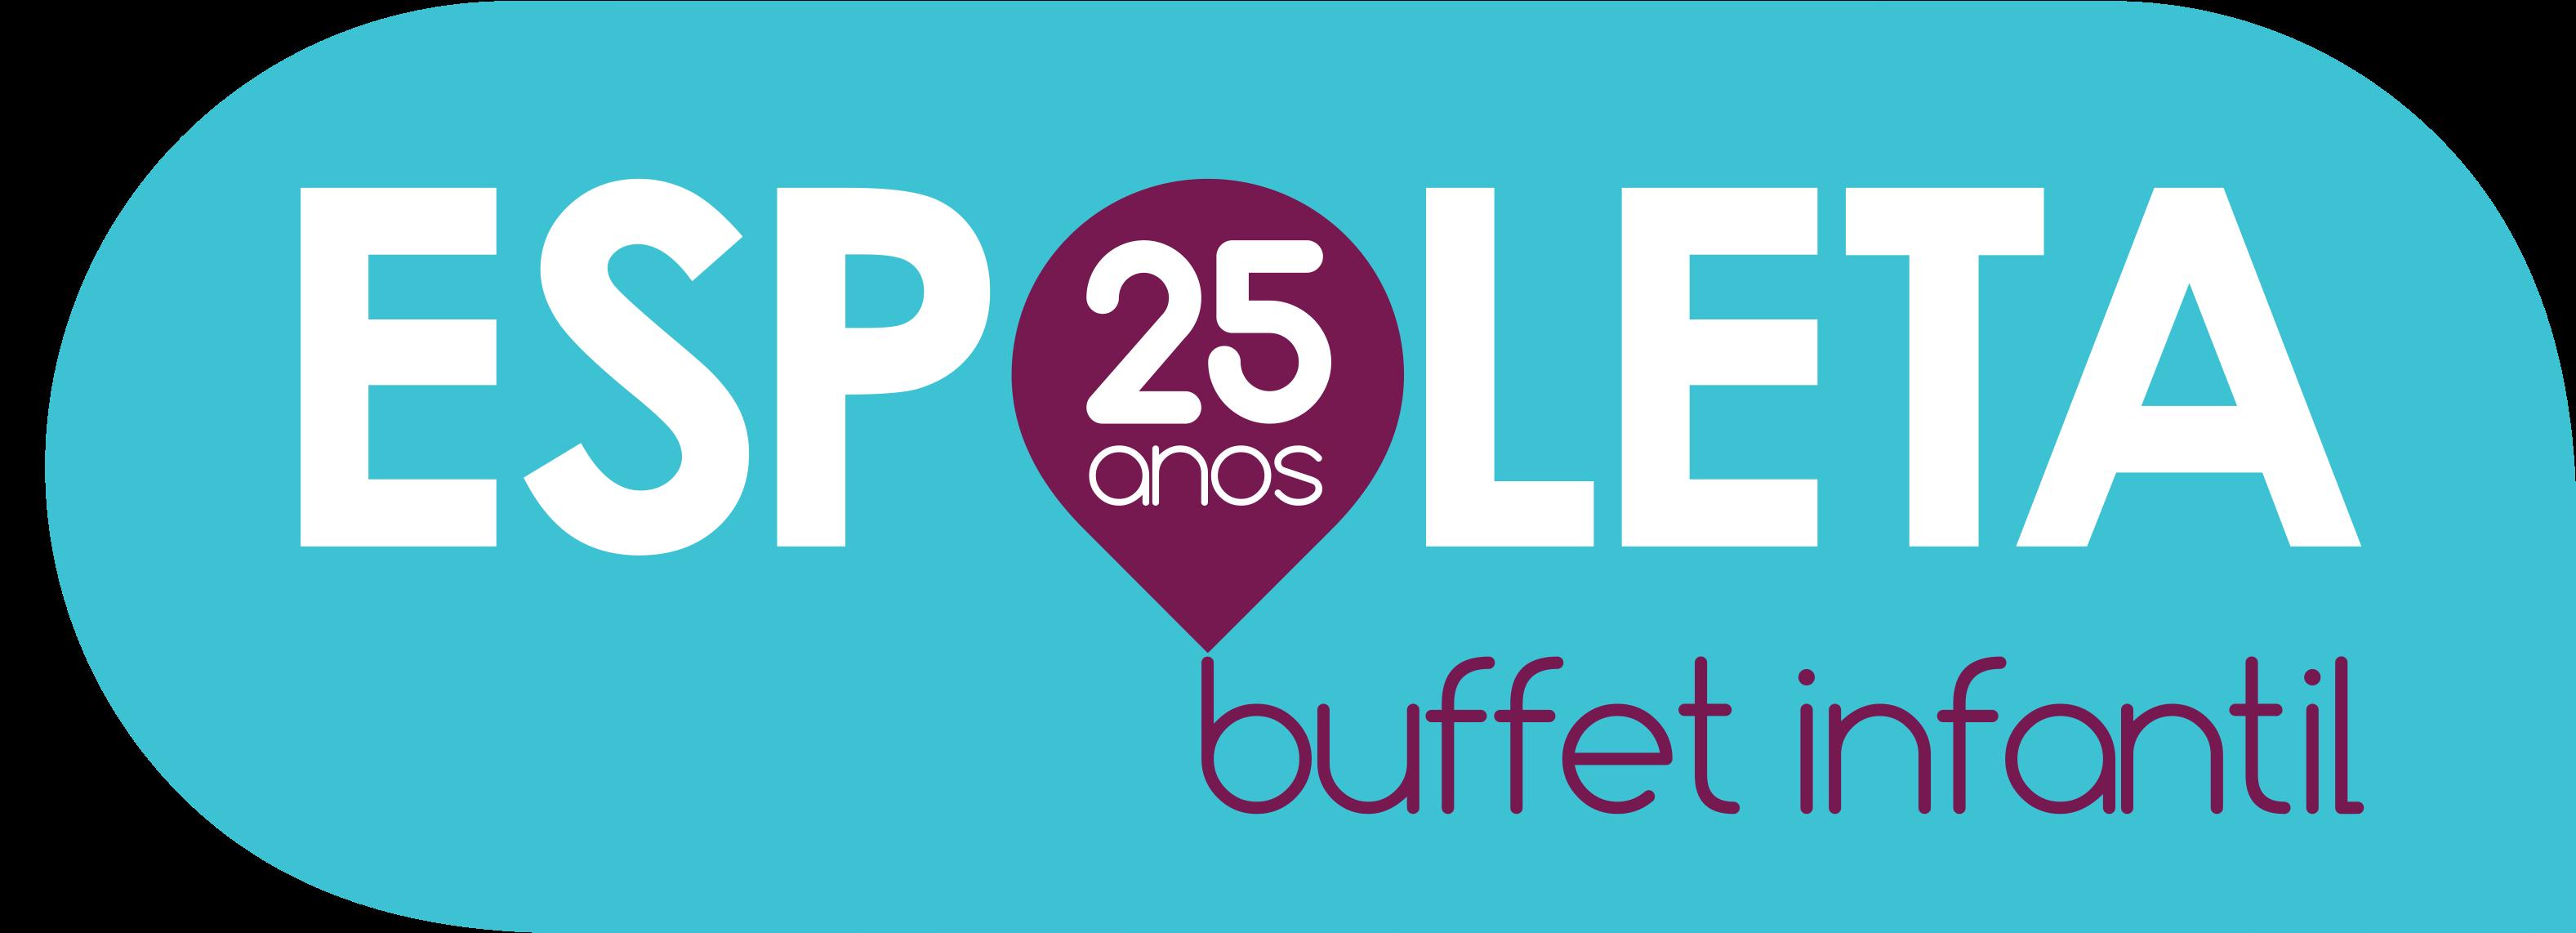 Logo Espoleta Buffet Infantil